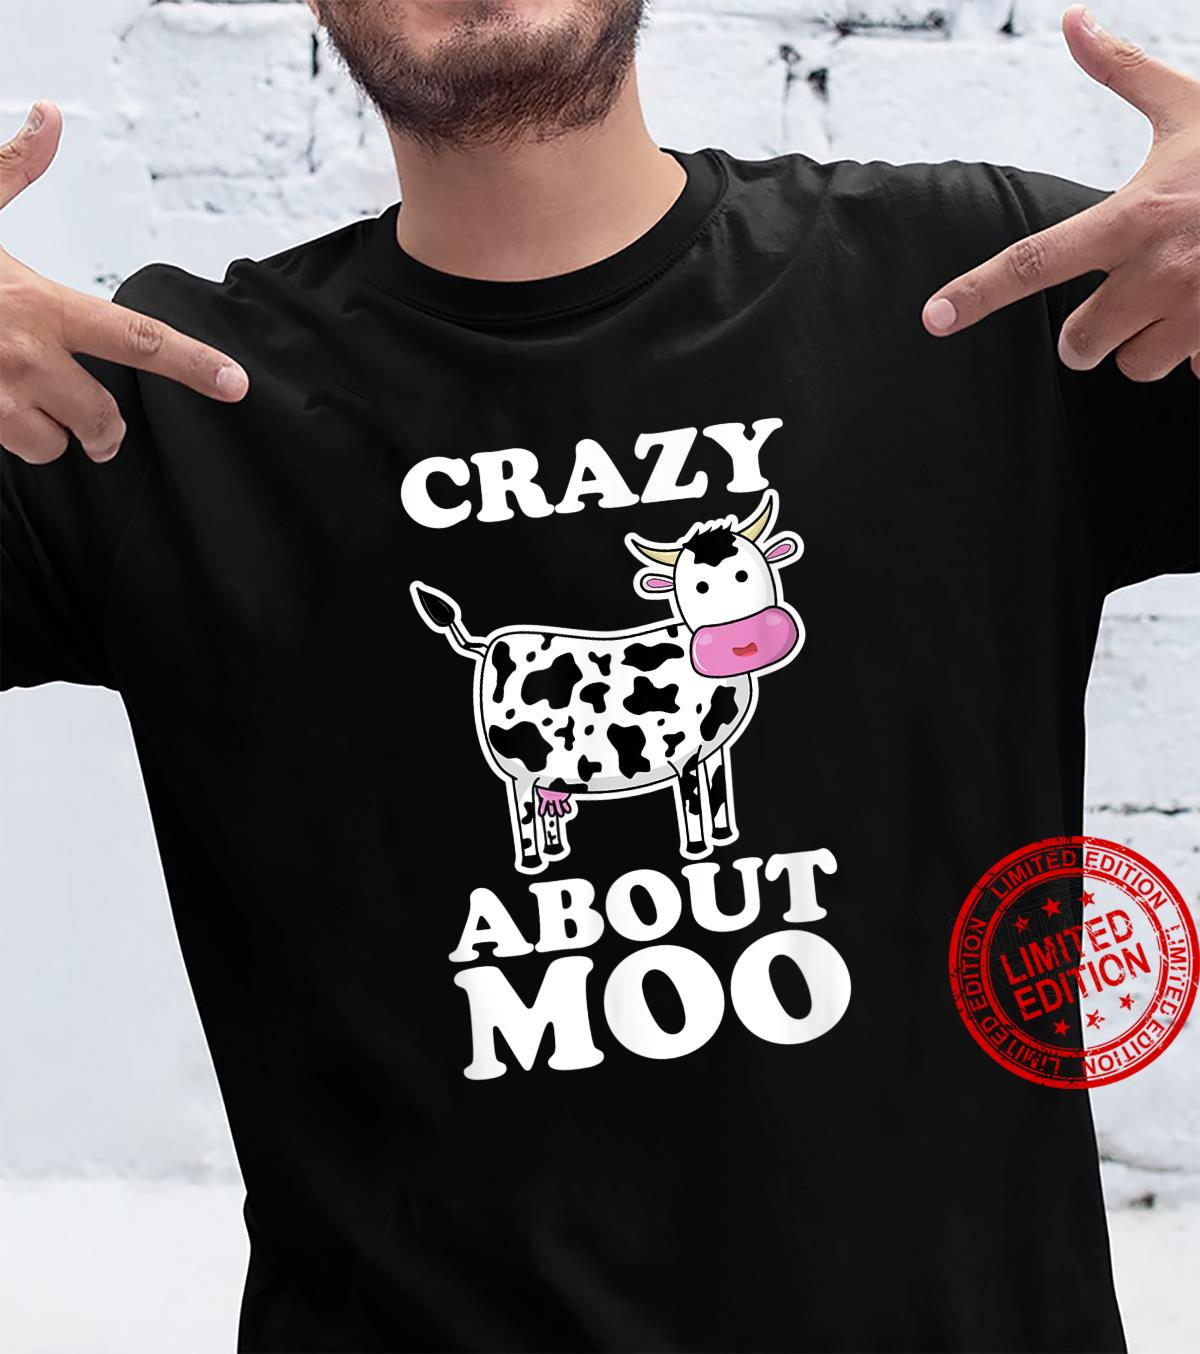 Crazy About Moo, Cows Pun Shirt